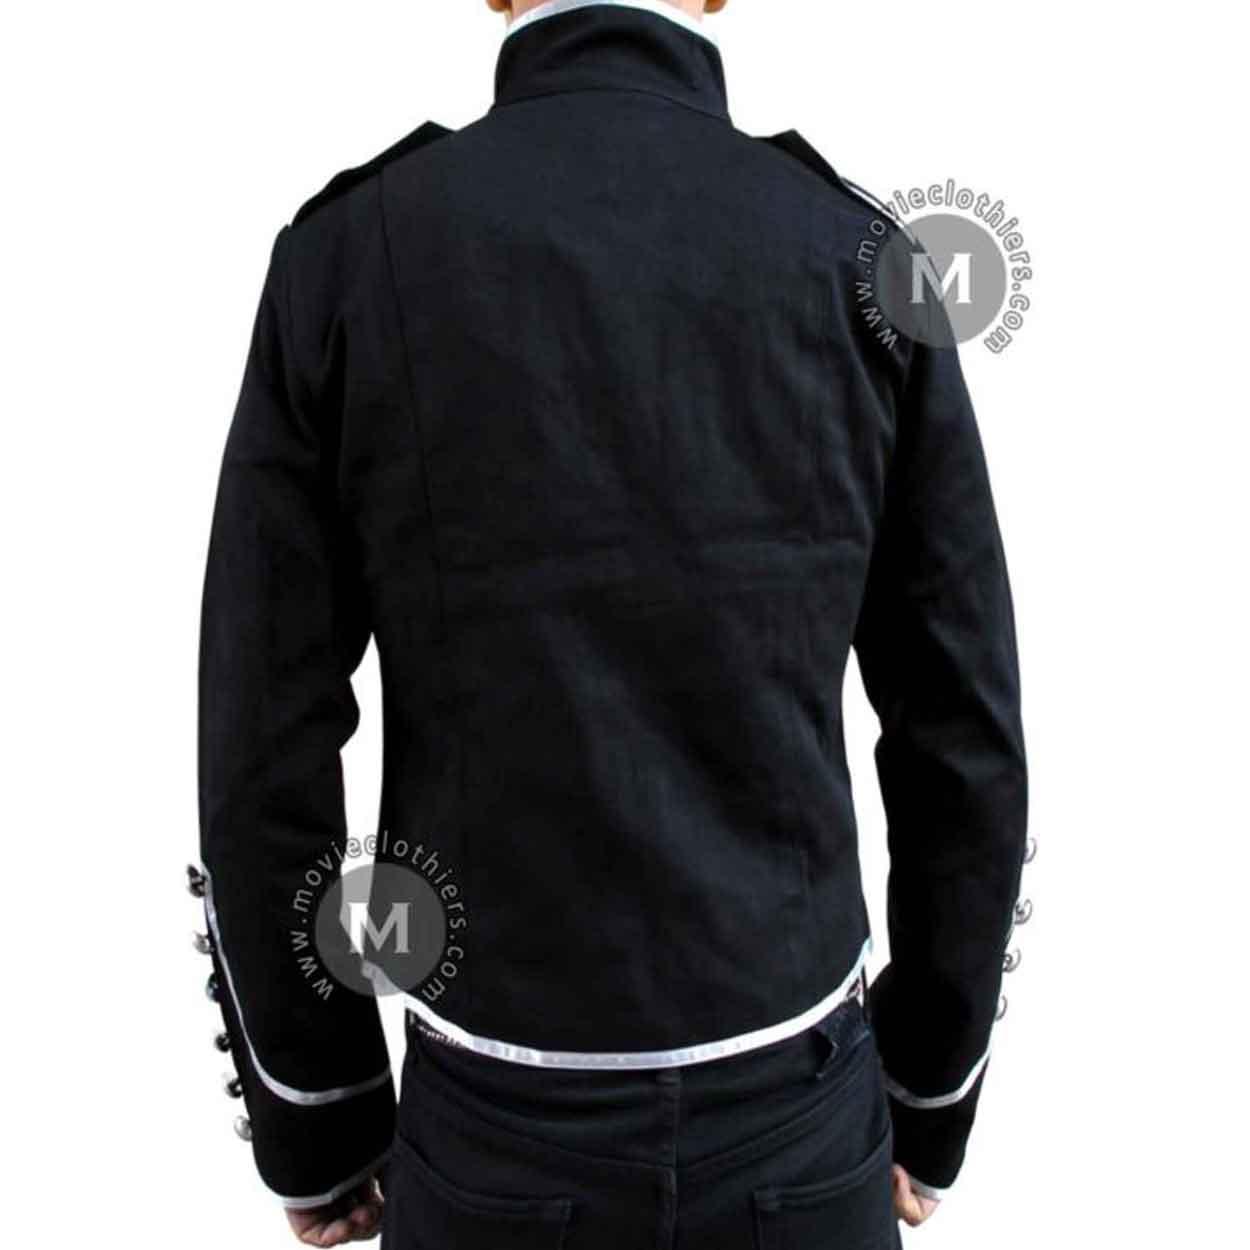 MCR Black Parade Jacket